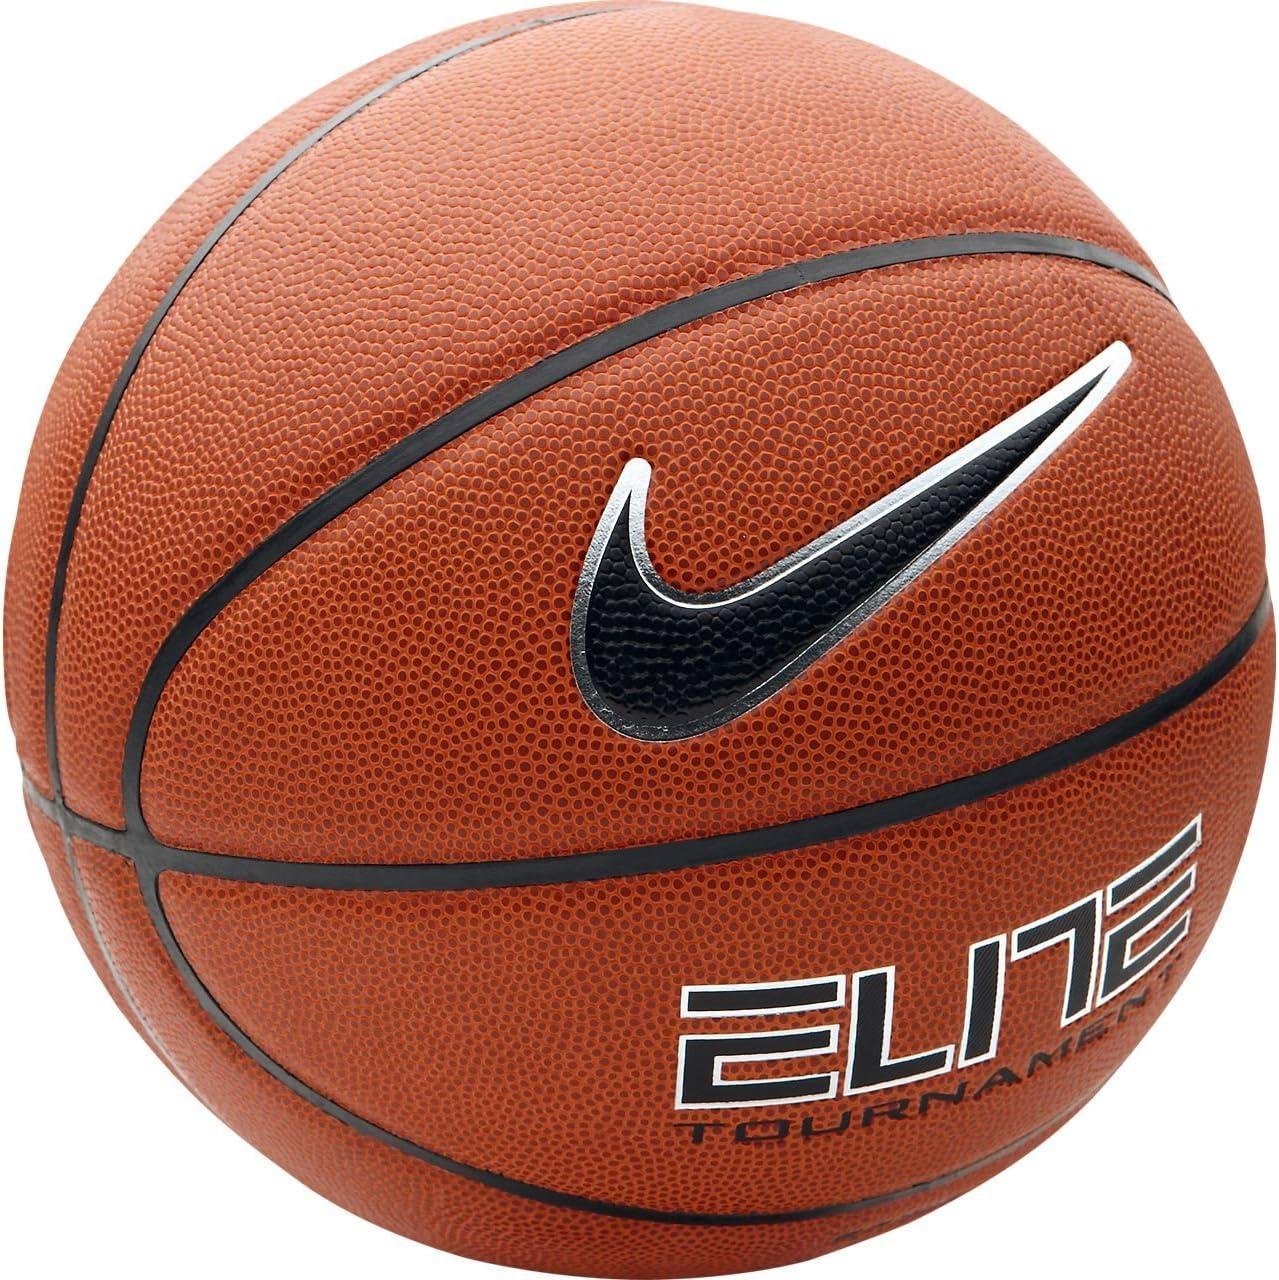 Nike Elite Championship